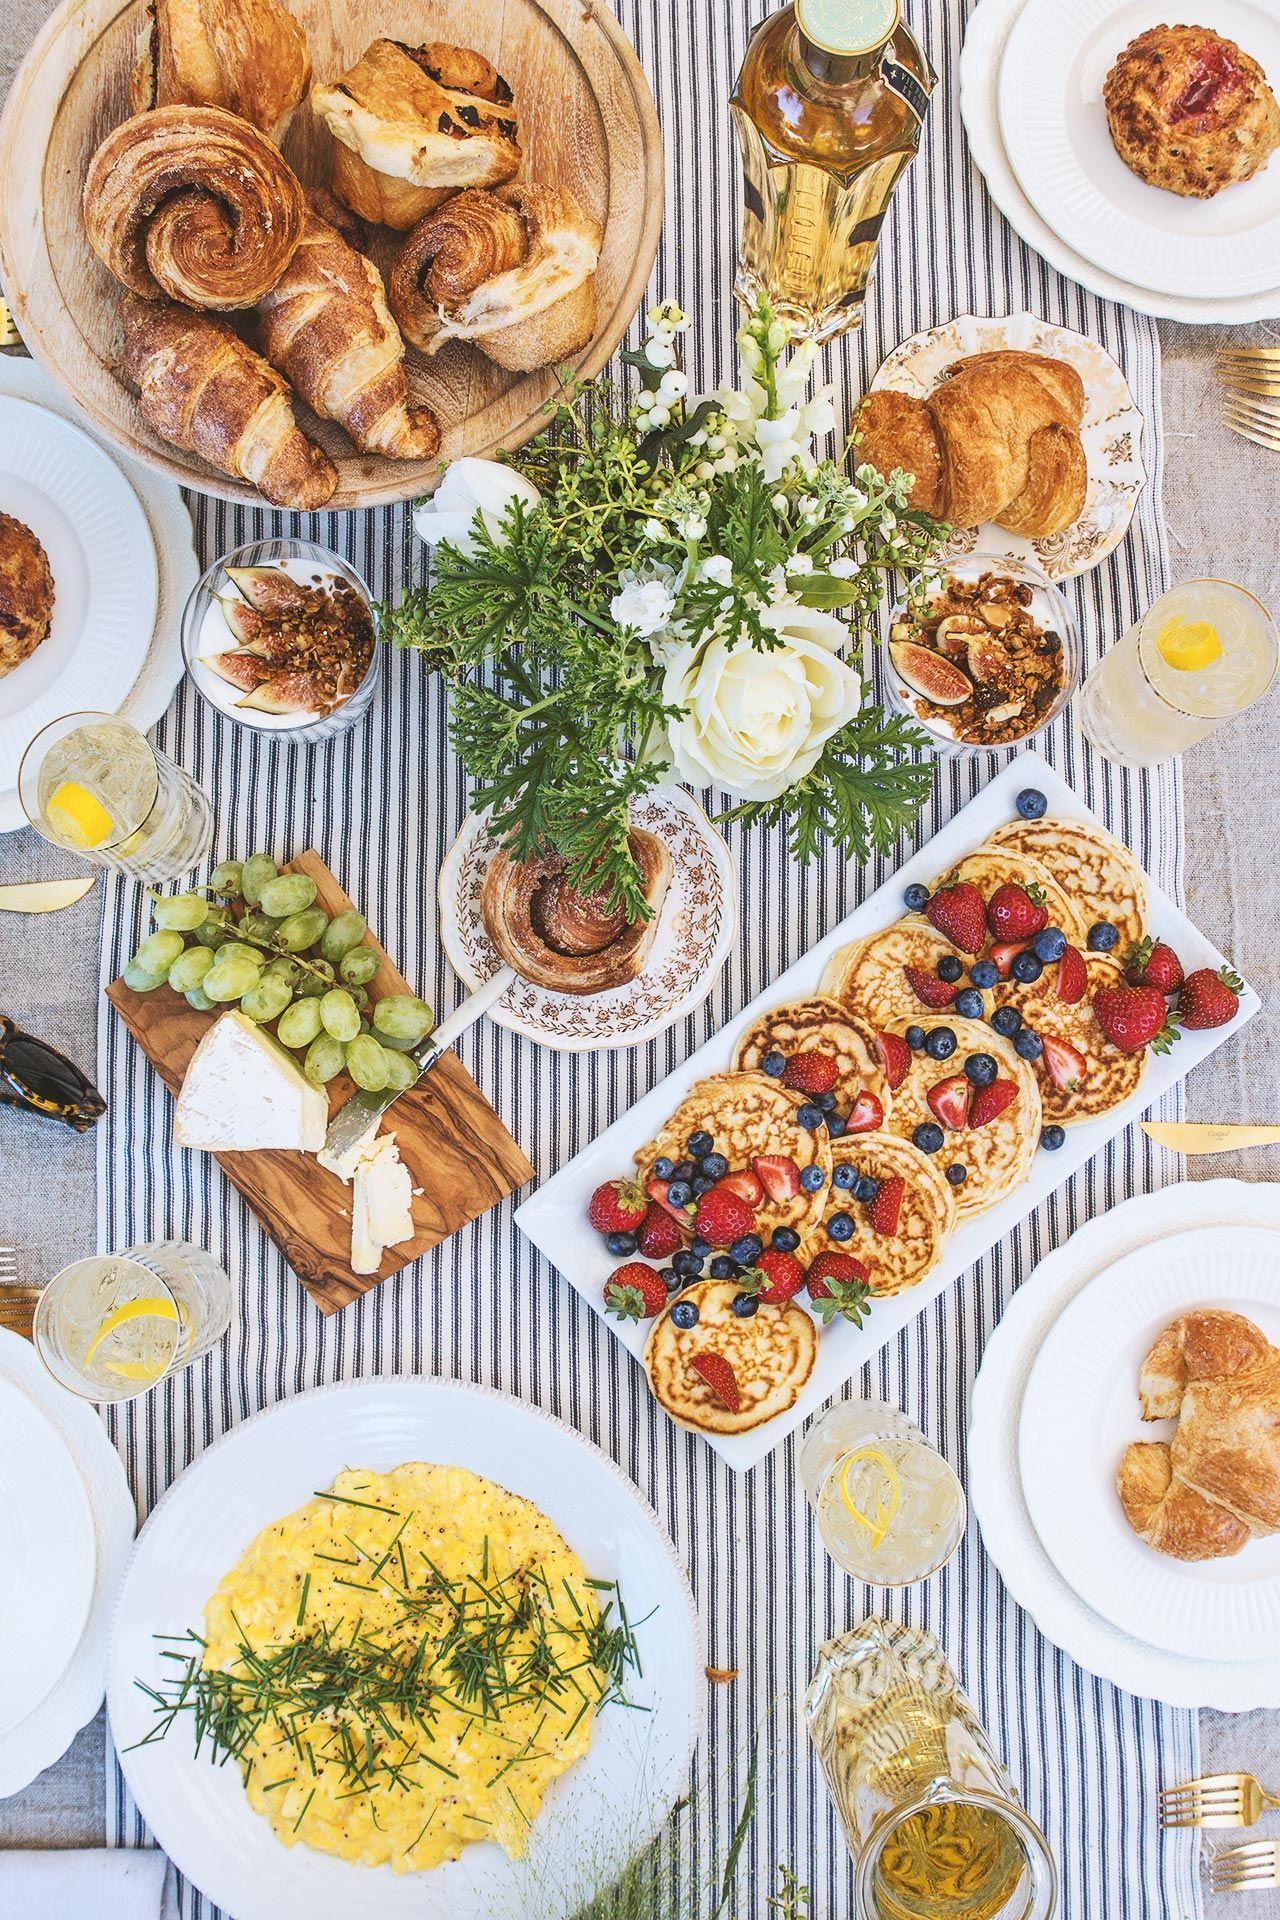 Vive The Daylife Brunch Brunch Table Setting Breakfast Table Setting